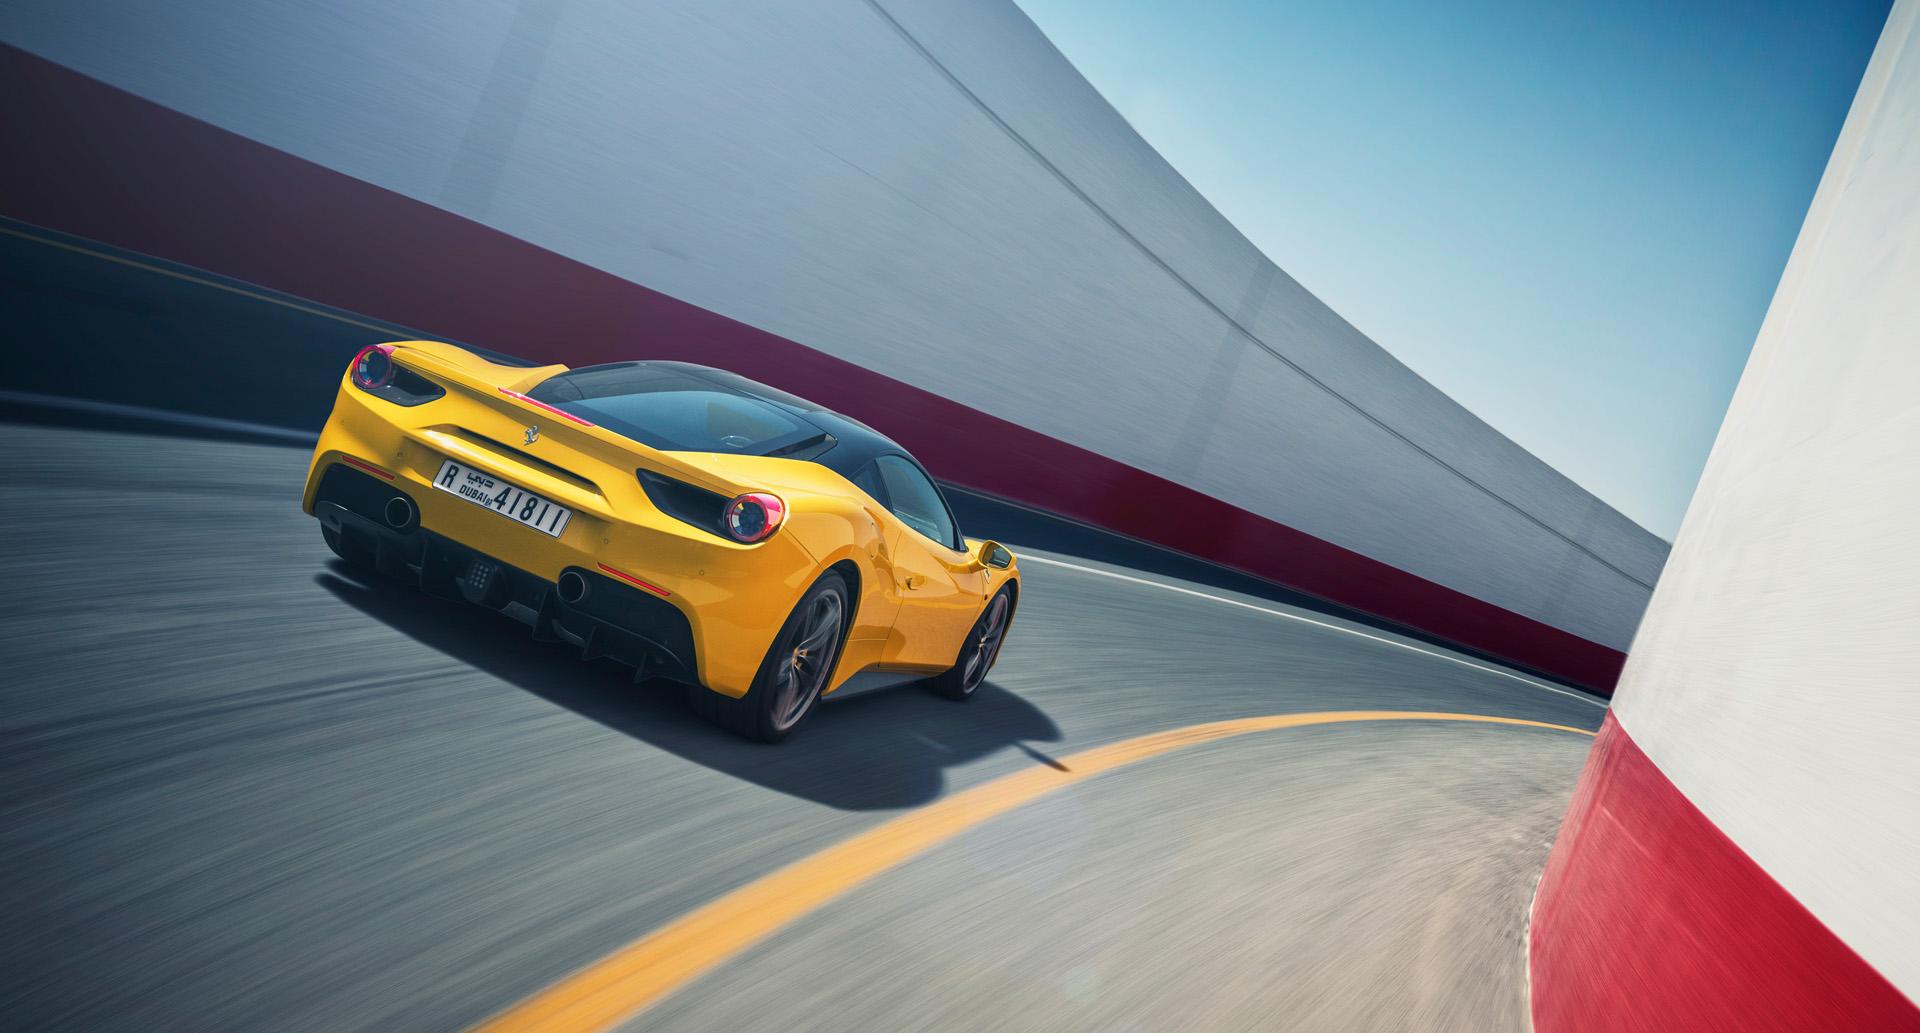 Nigel Harniman Yellow Ferrari car moving race track